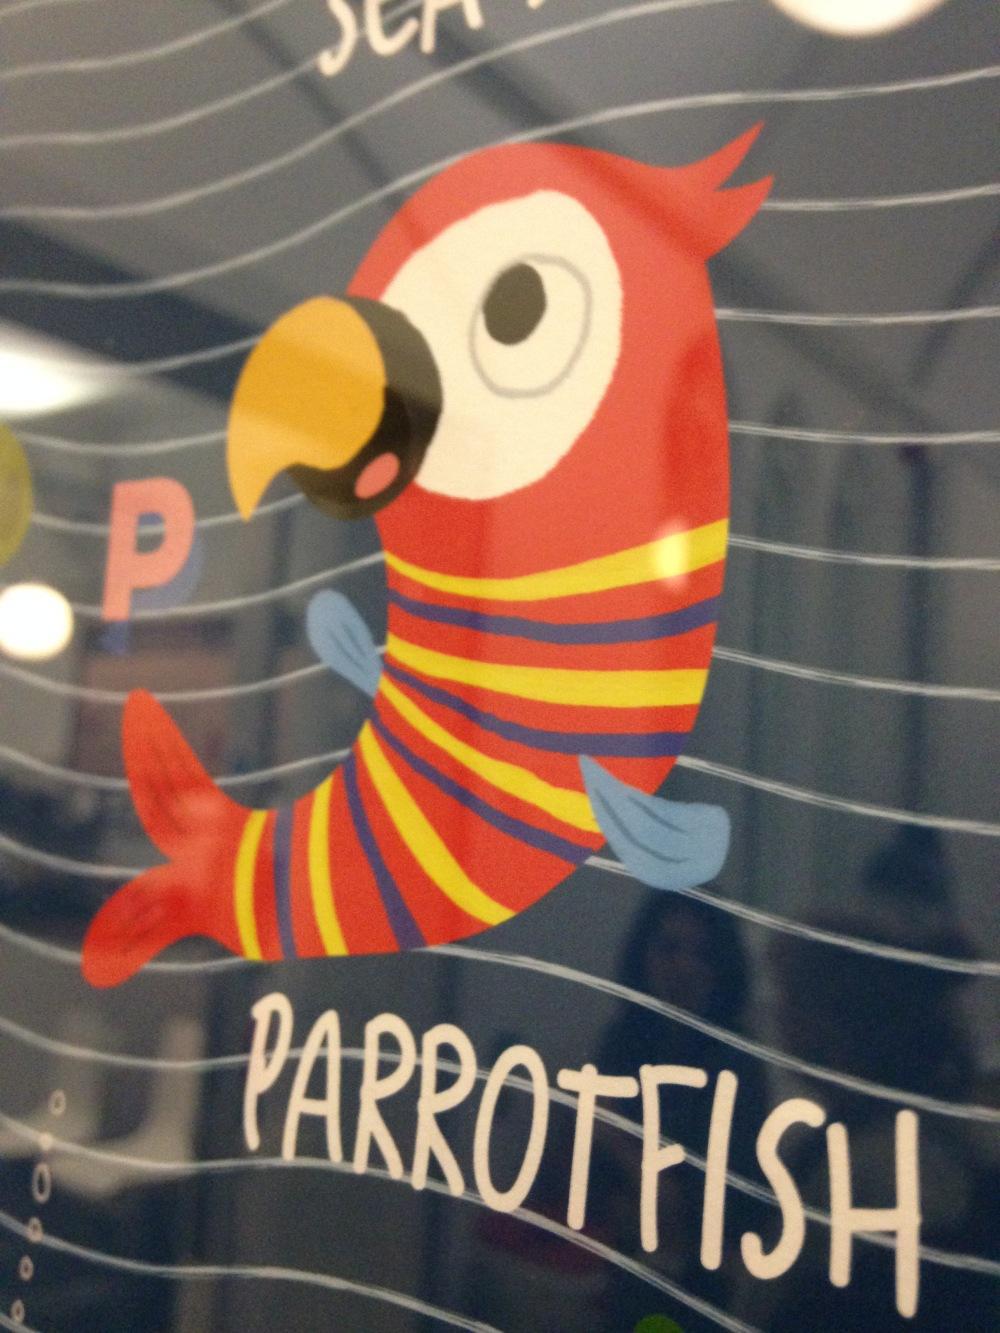 06 PARROT FISH